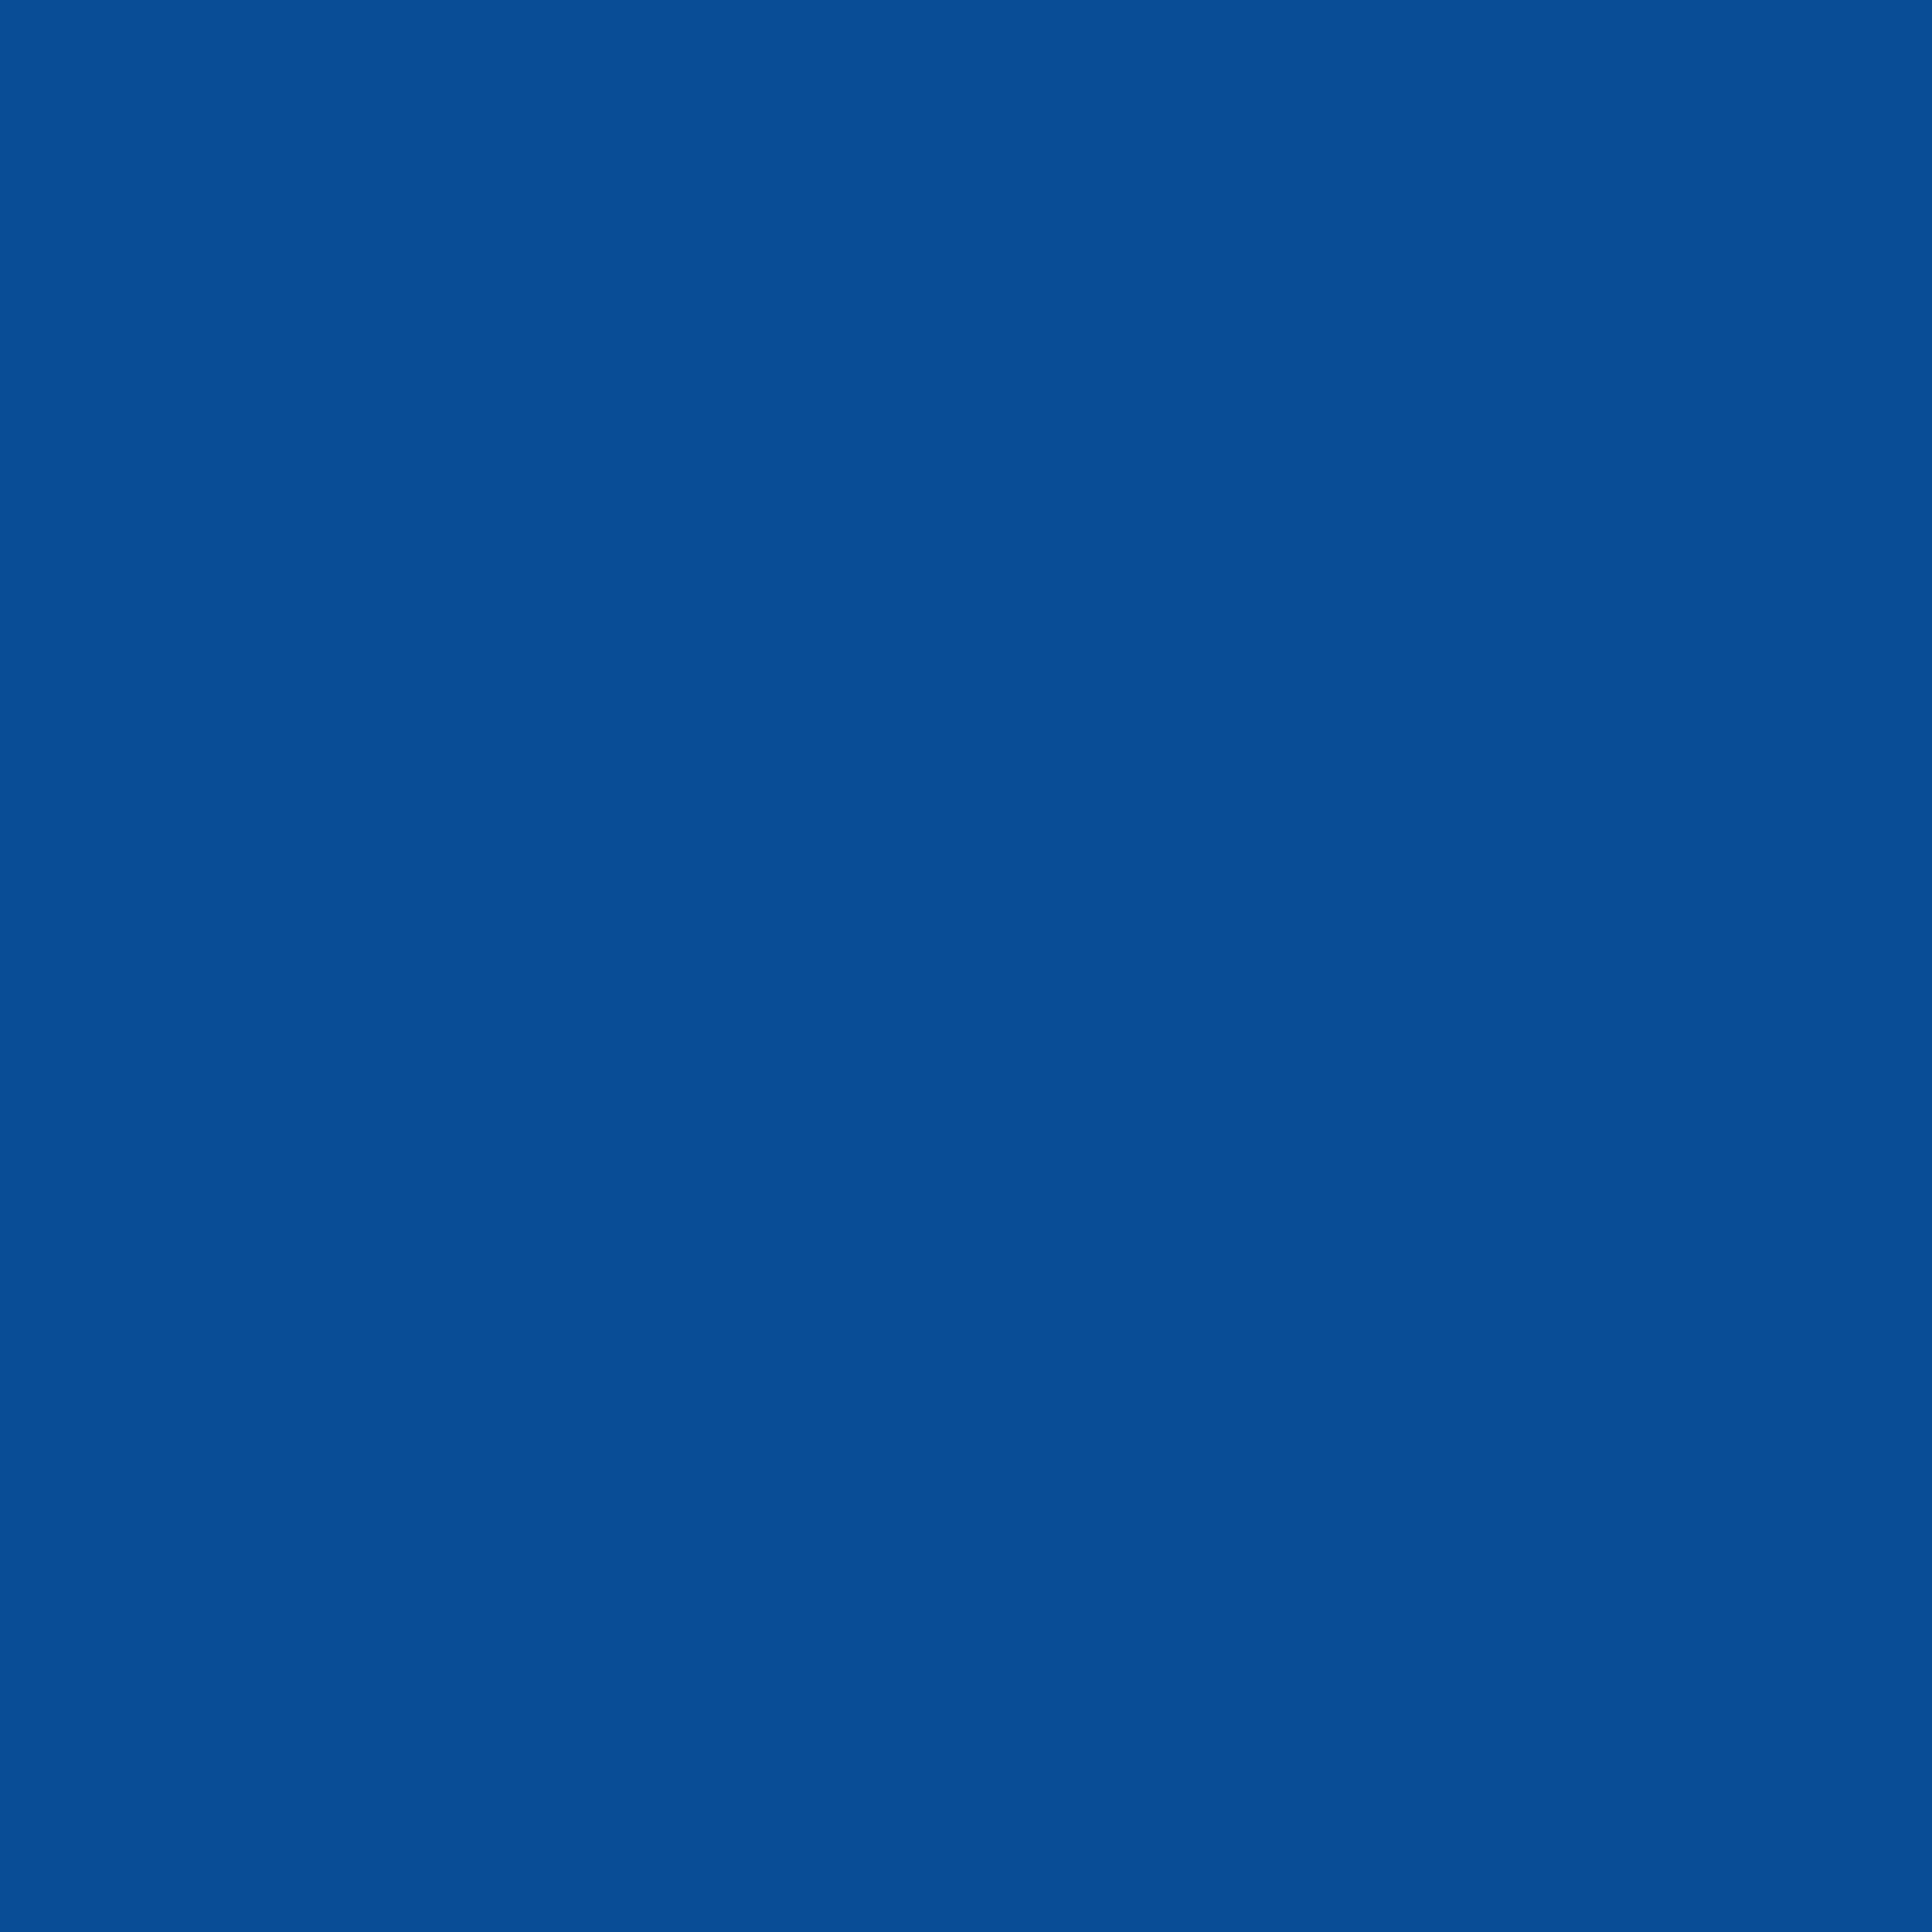 blue-01.jpg